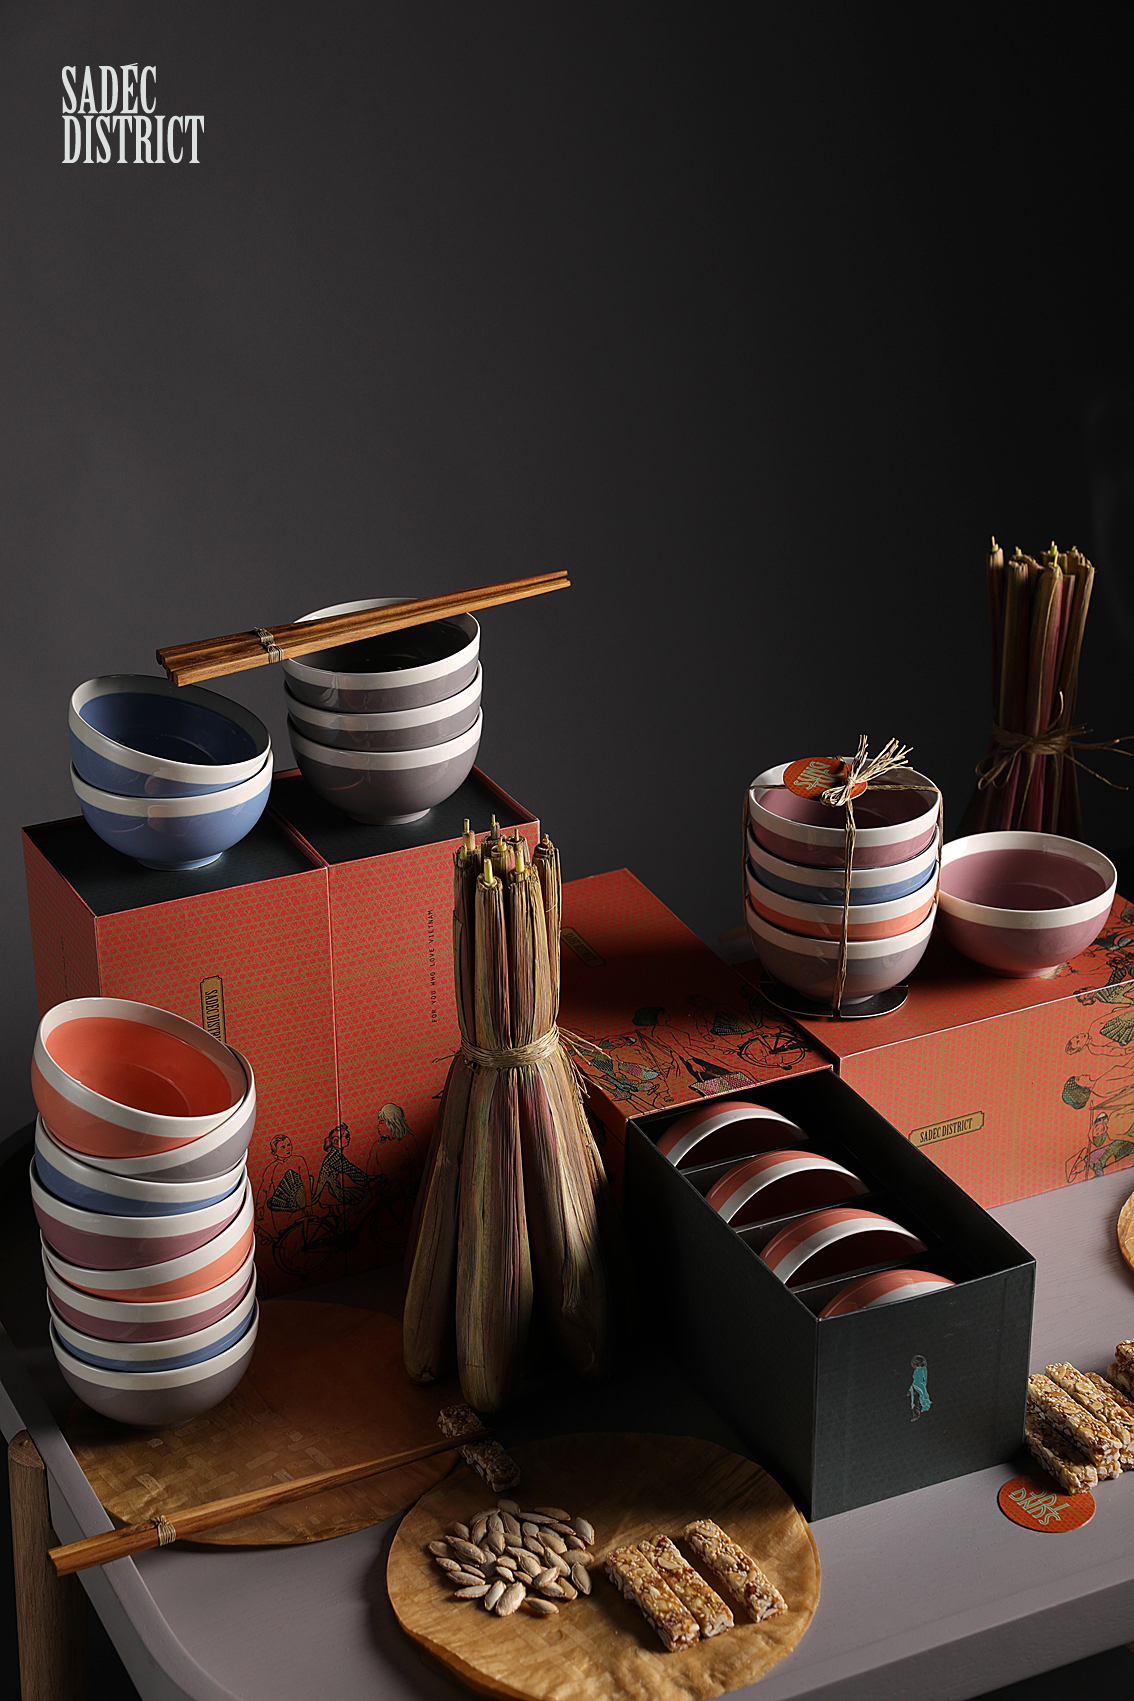 Sung Túc gift set